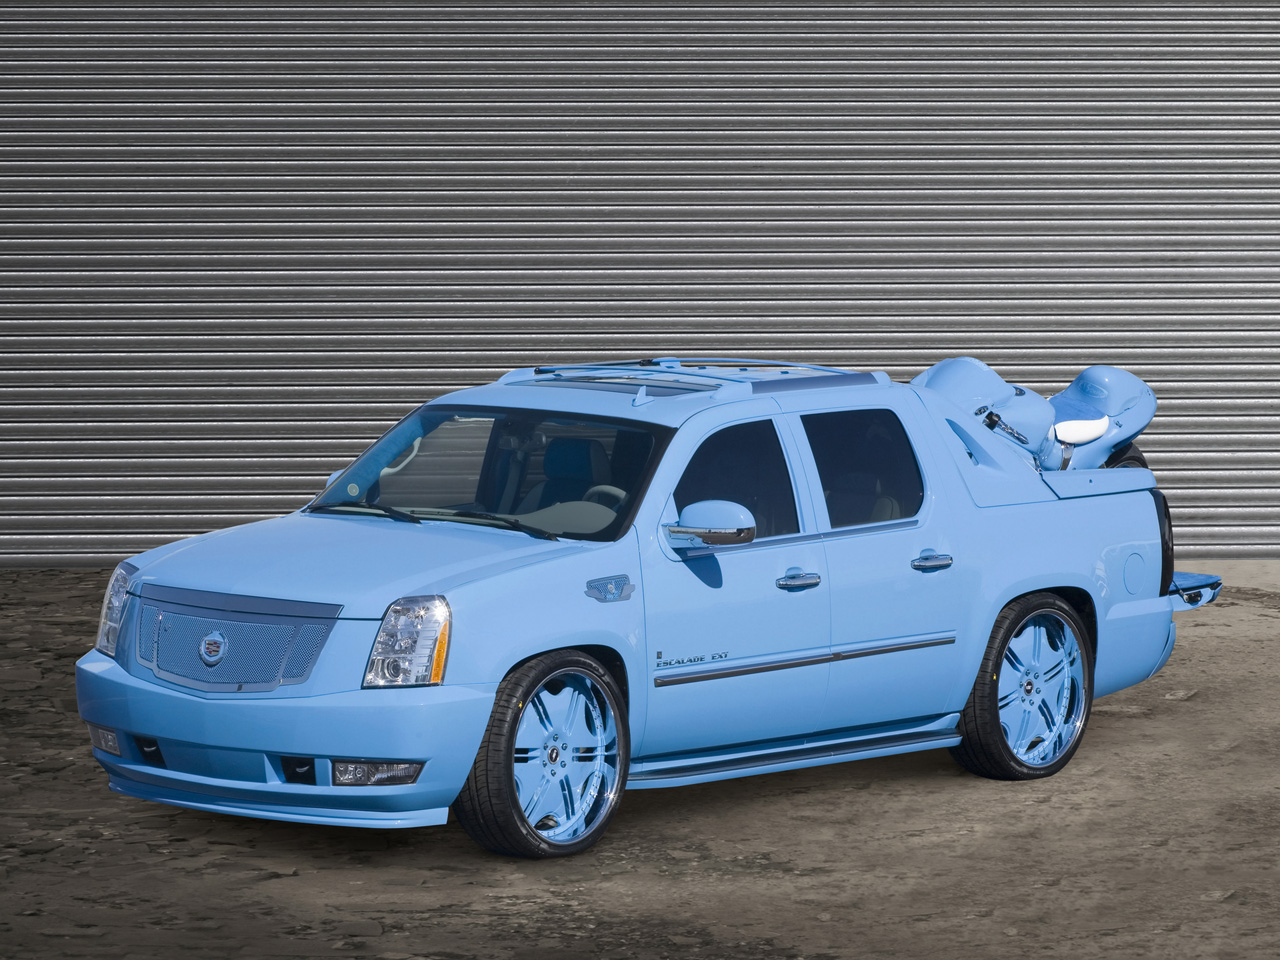 Cadillac Model 2012 foto - 3